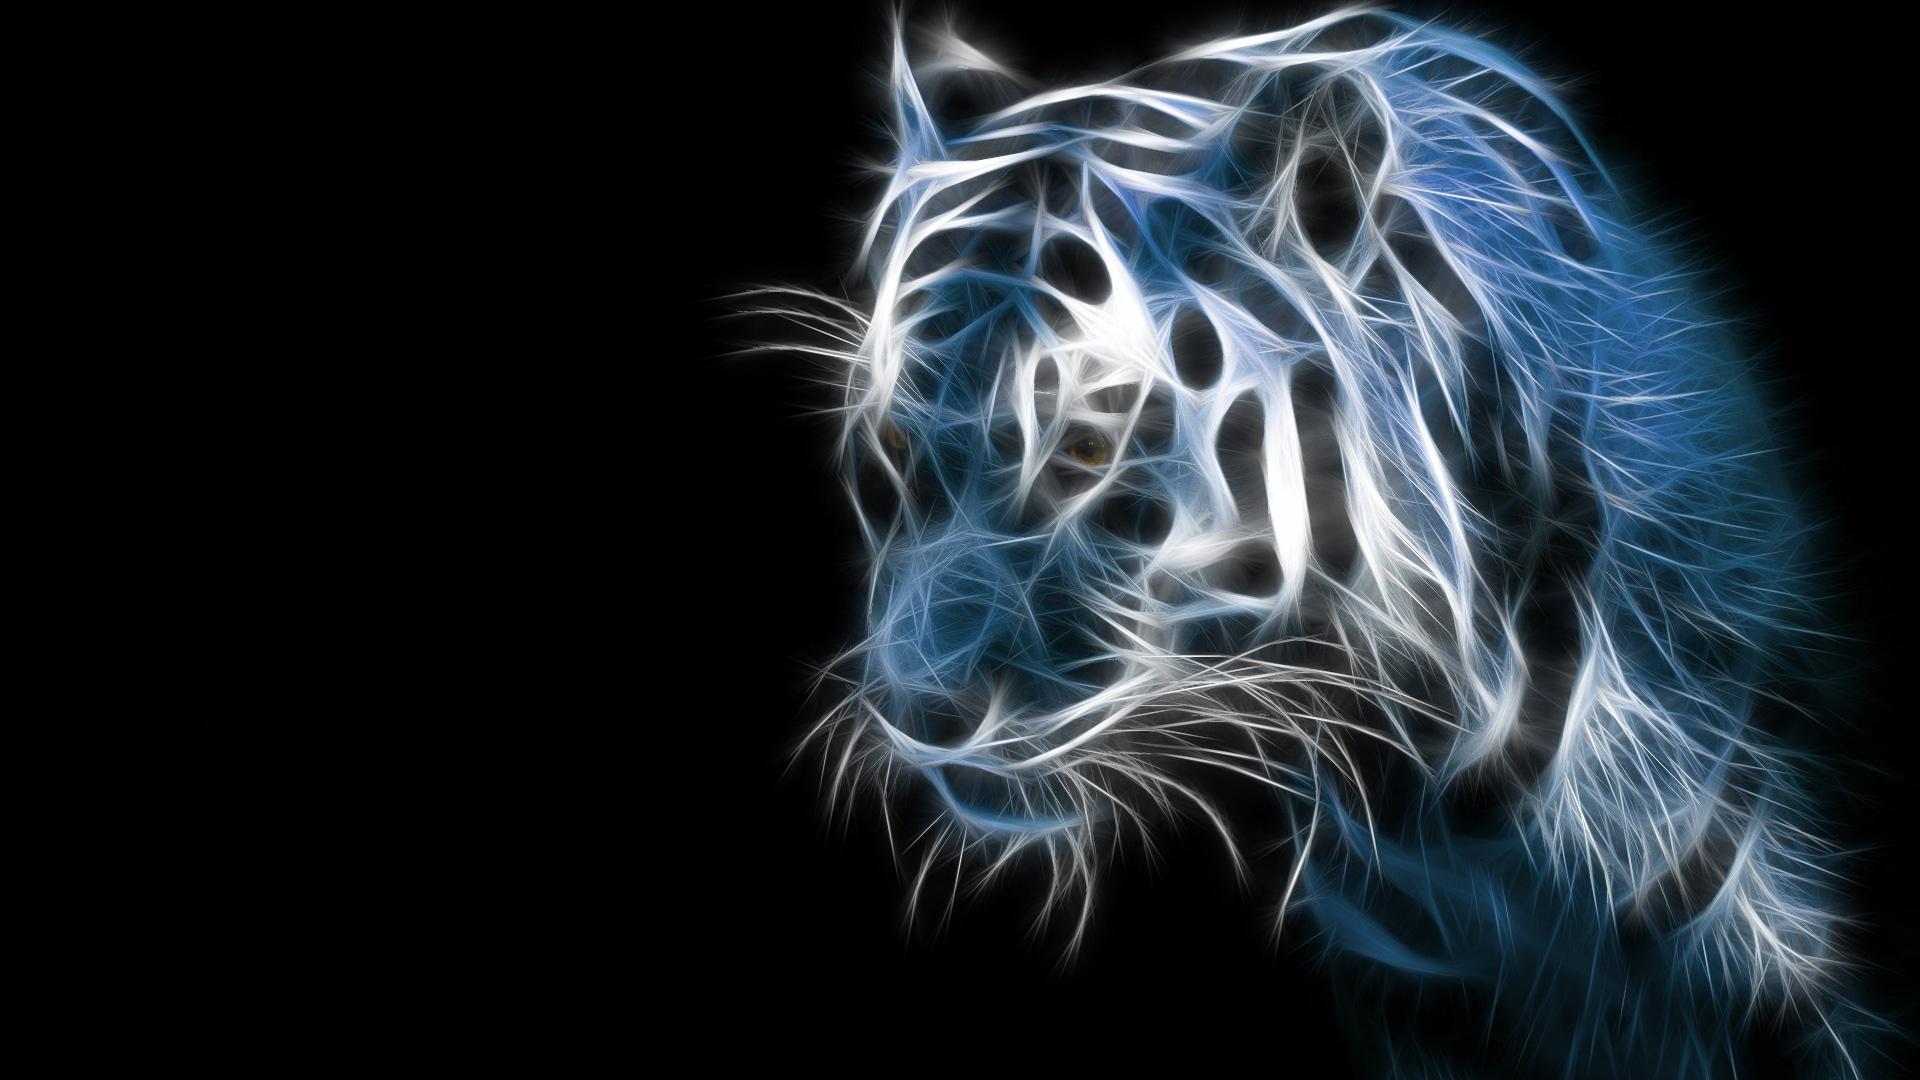 neon tiger black desktop wallpaper 1920x1080